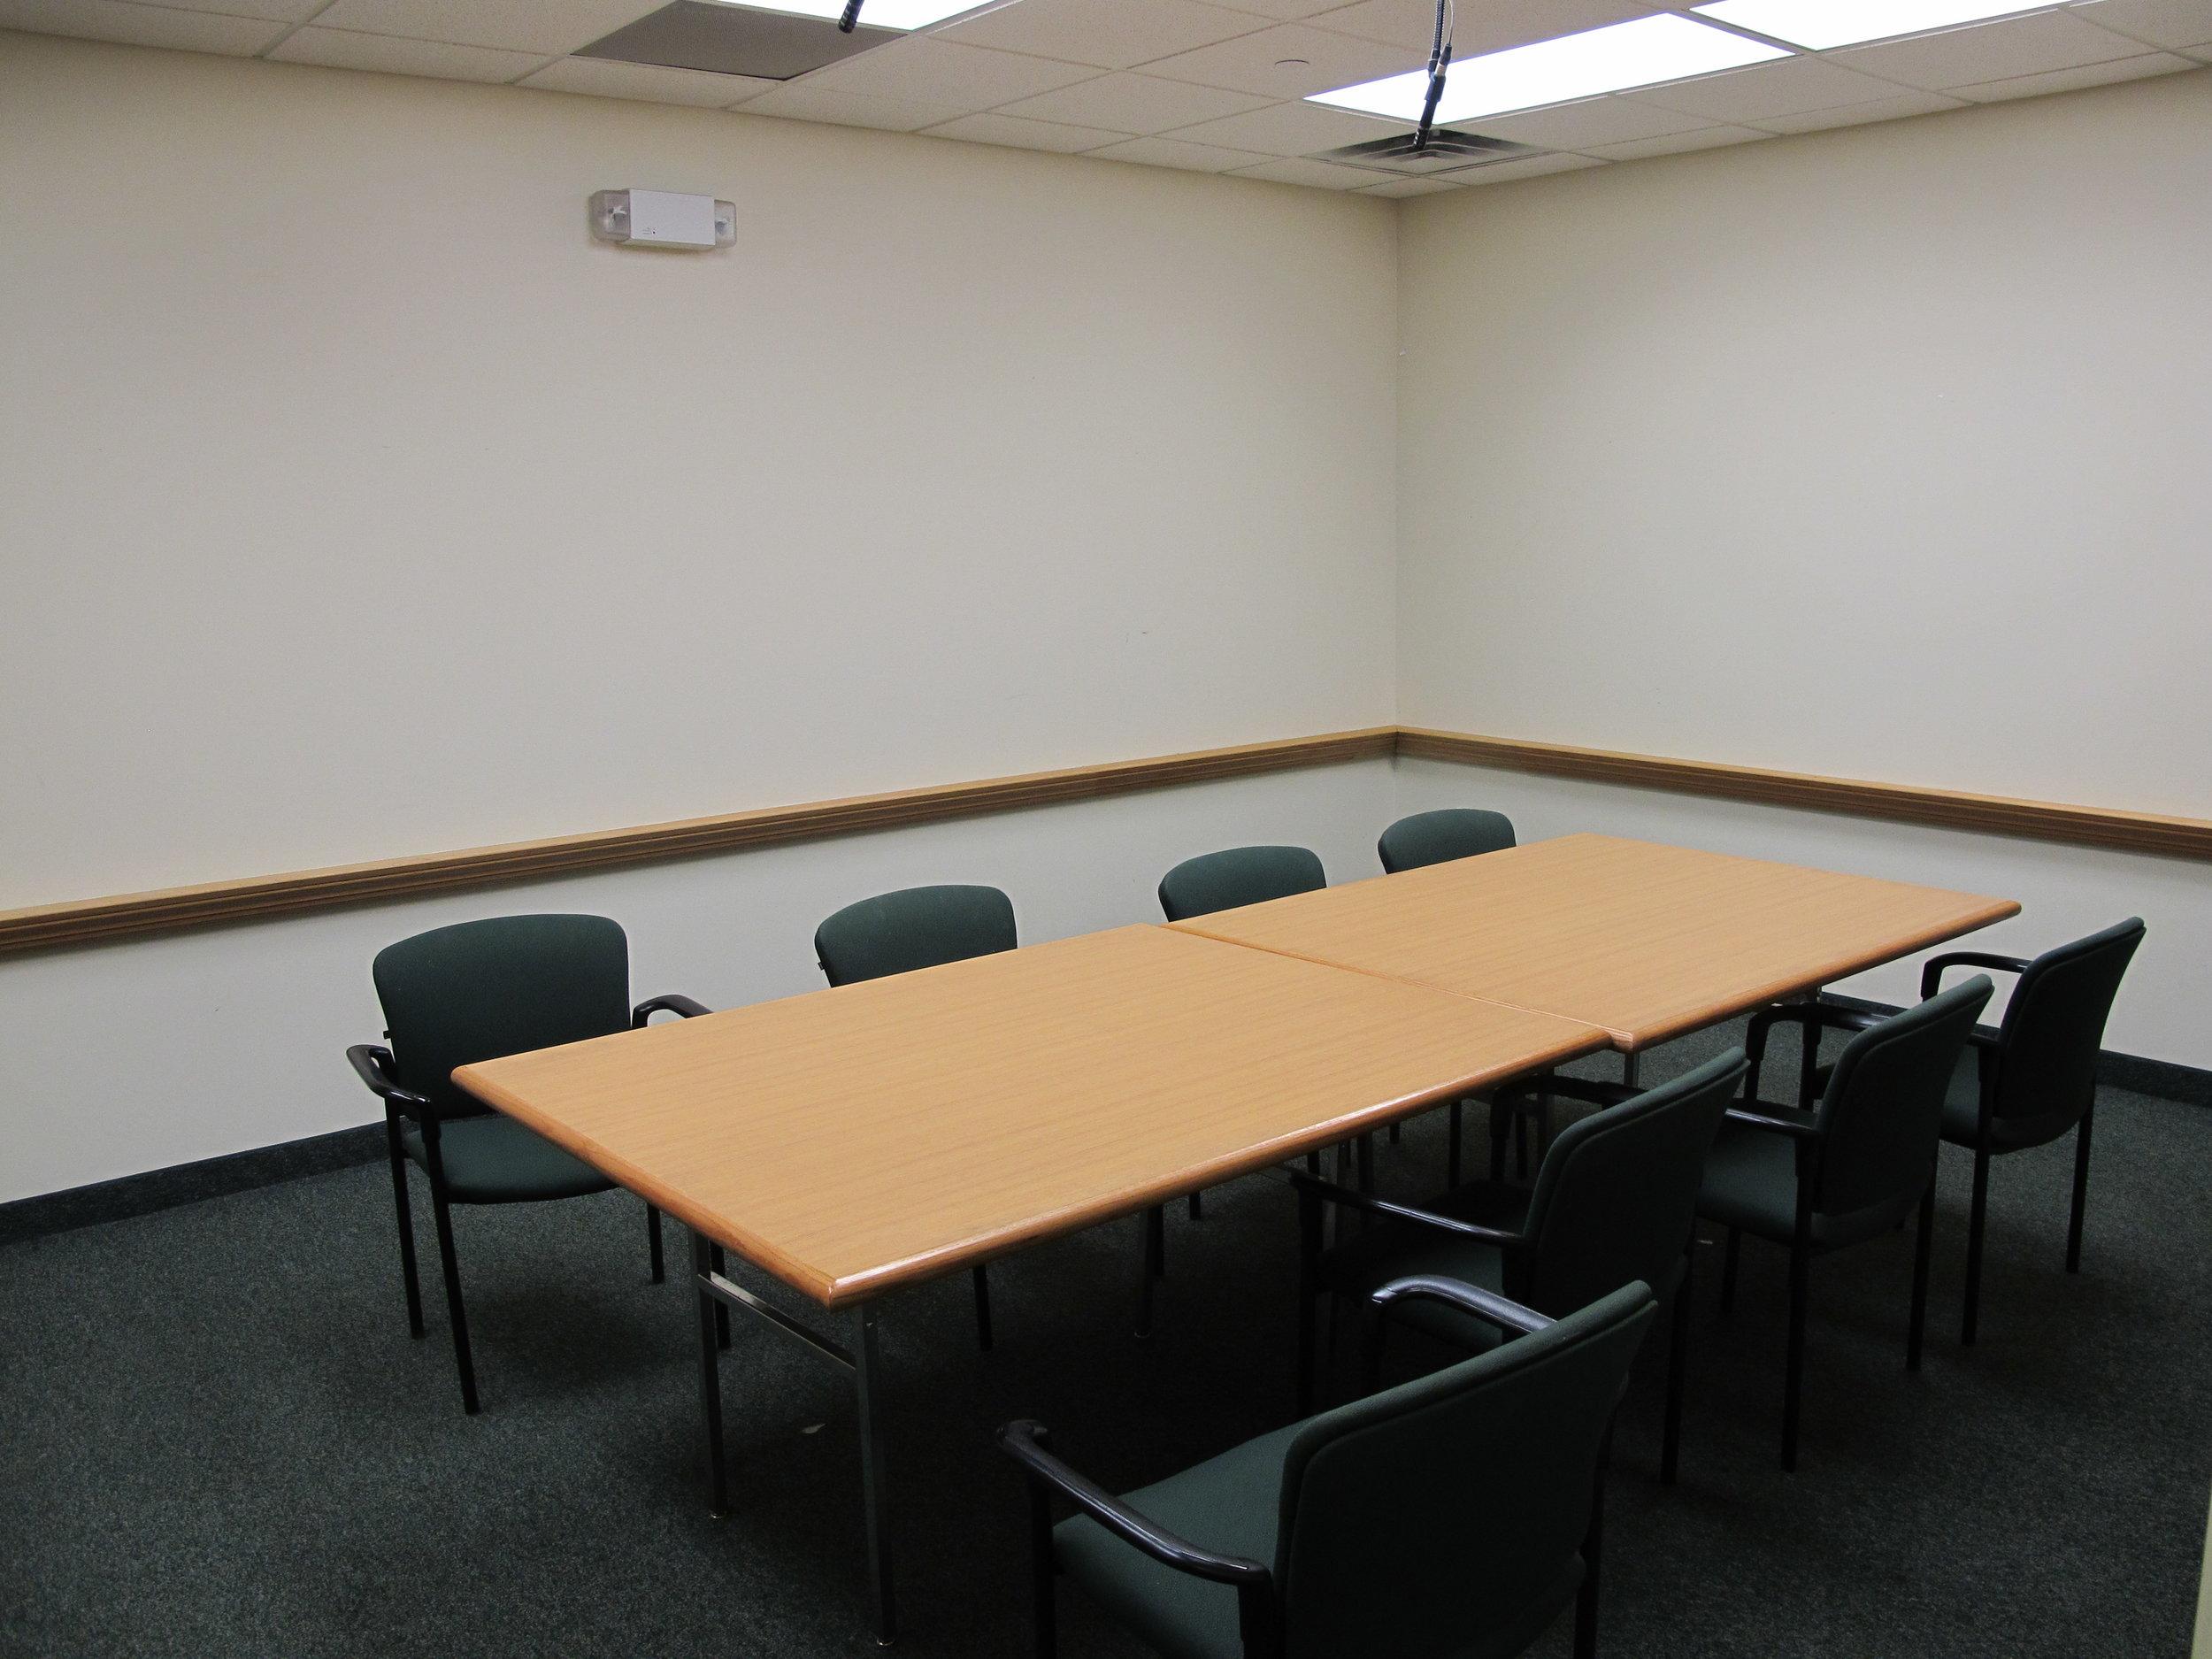 Indianapolis- Focus Group Room image 2.jpg